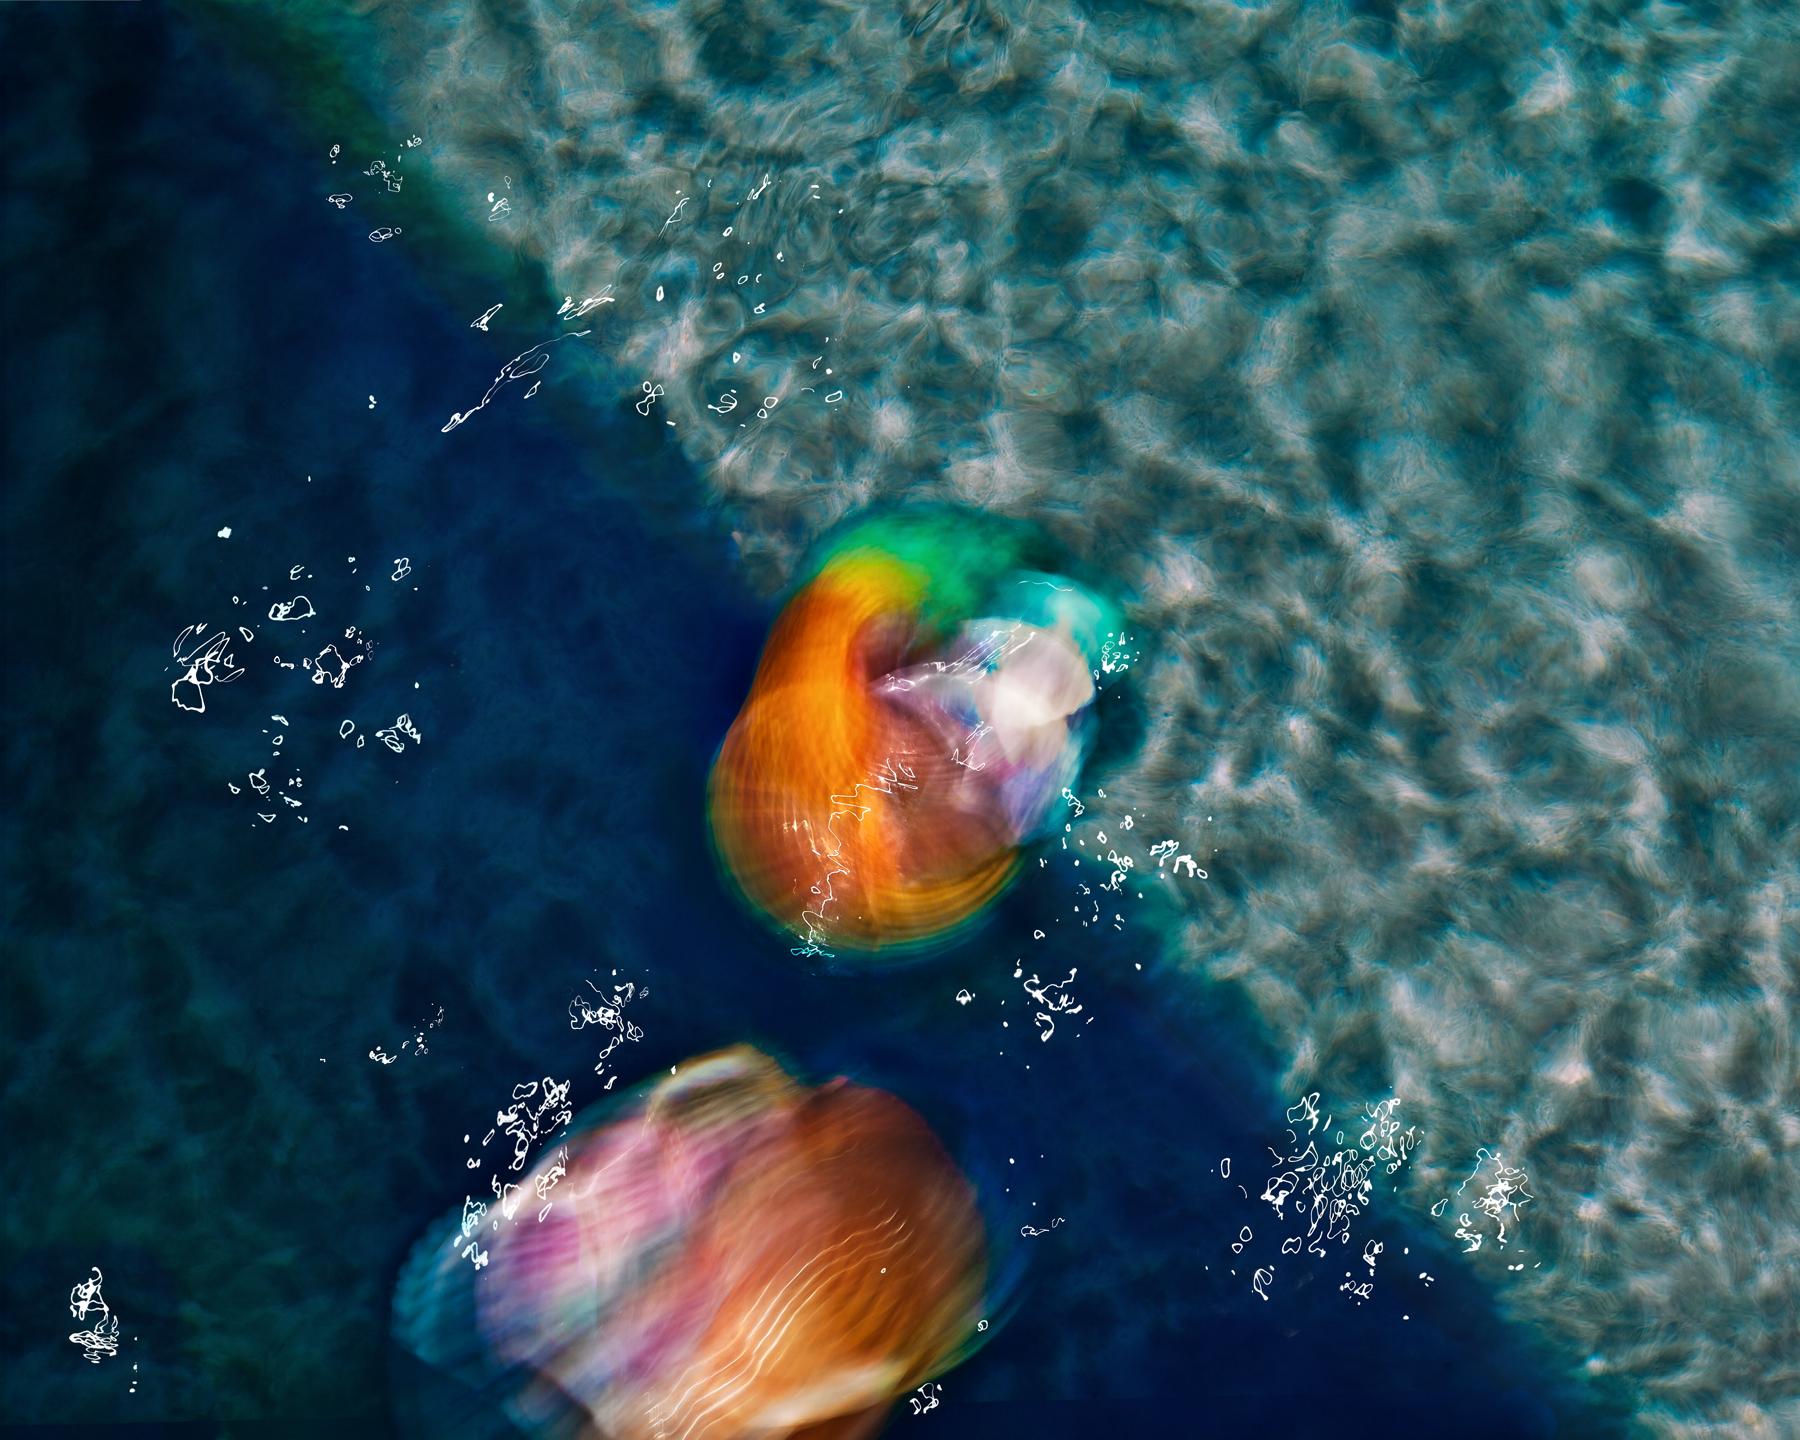 Cheryl_Rossum_Ocean Life_Tonna Coming Ashore_1.jpg